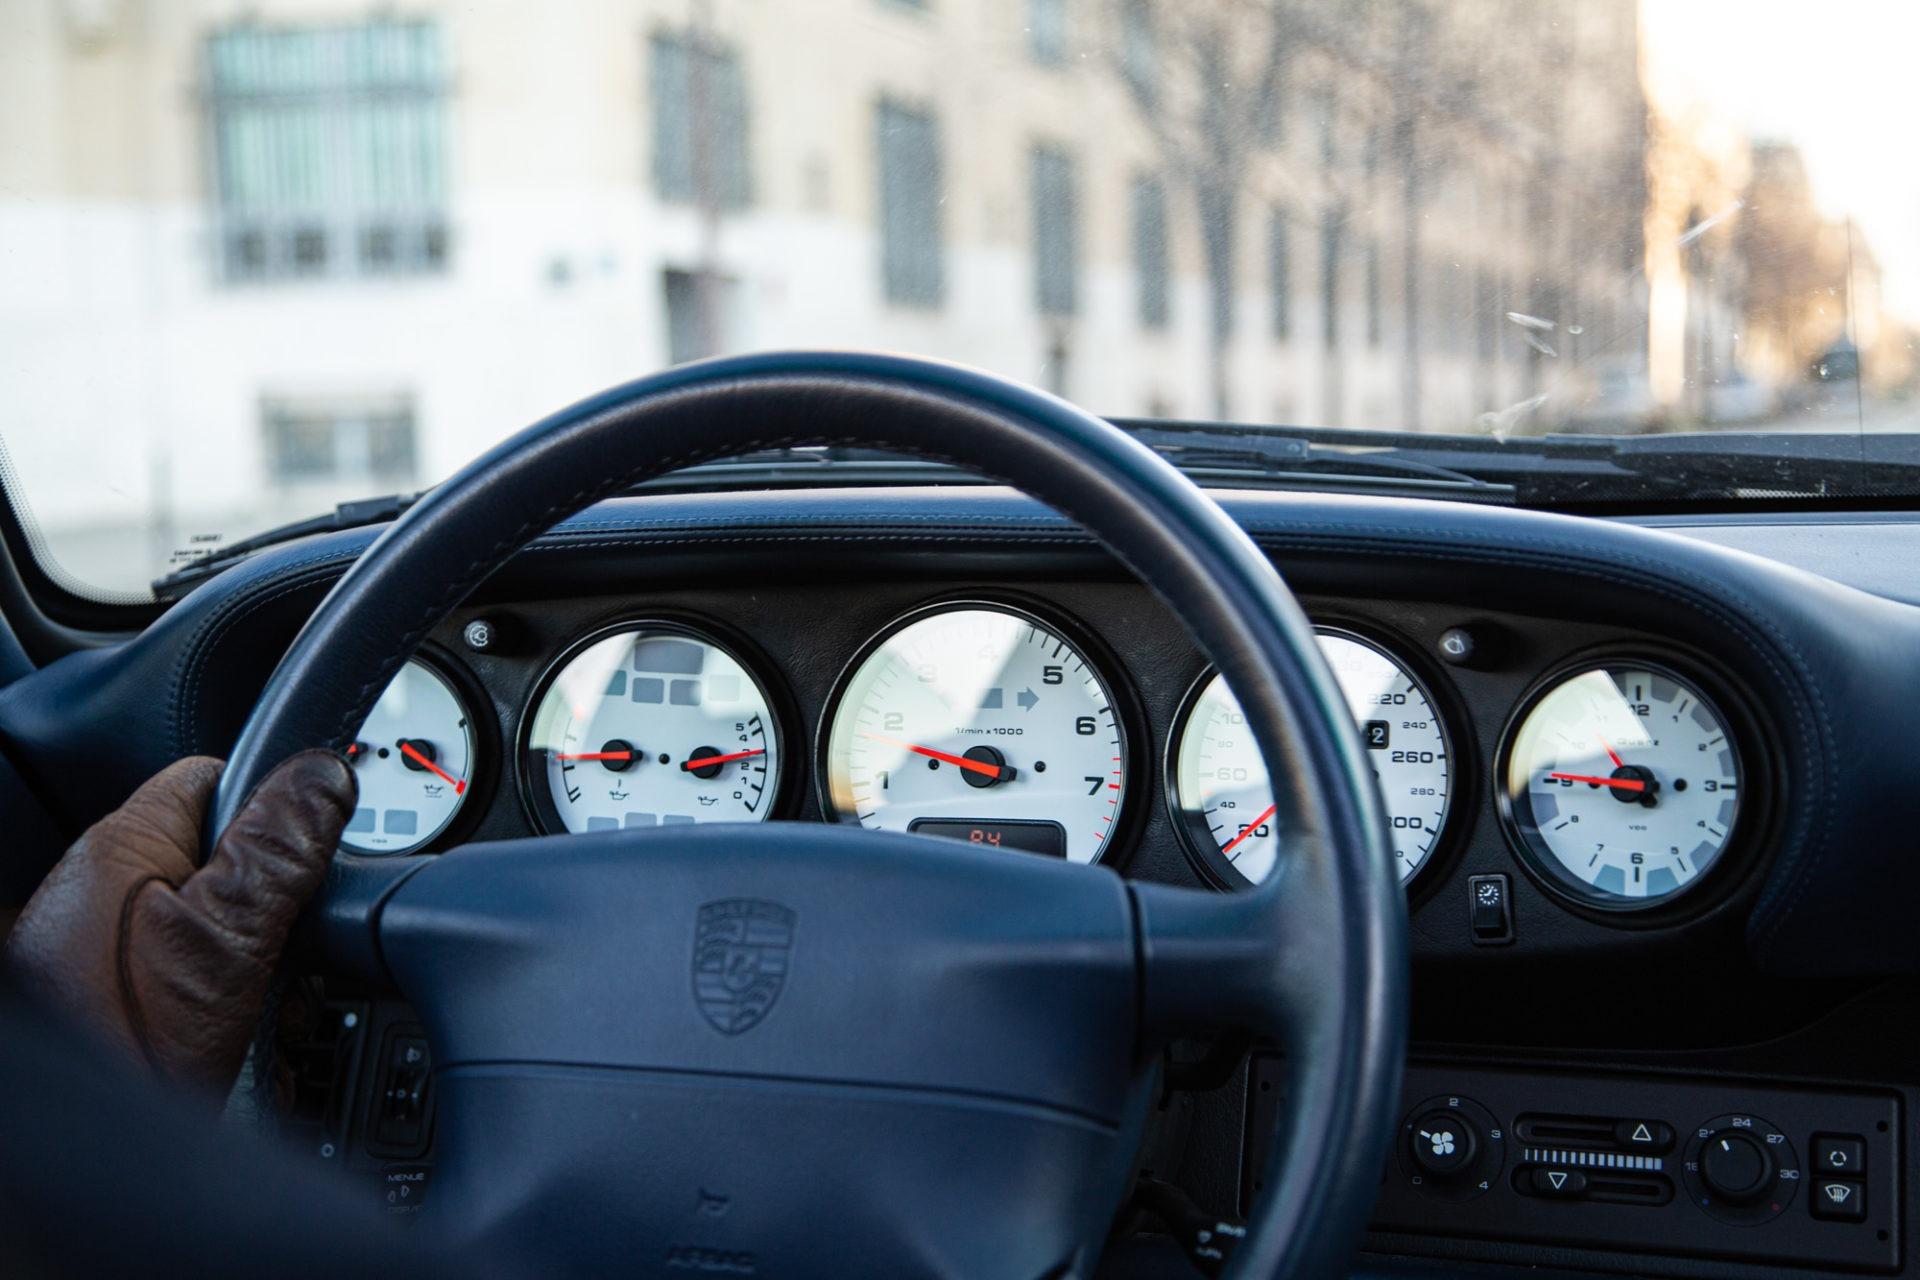 Porsche 911 Type 993 Turbo - Tableau de bord